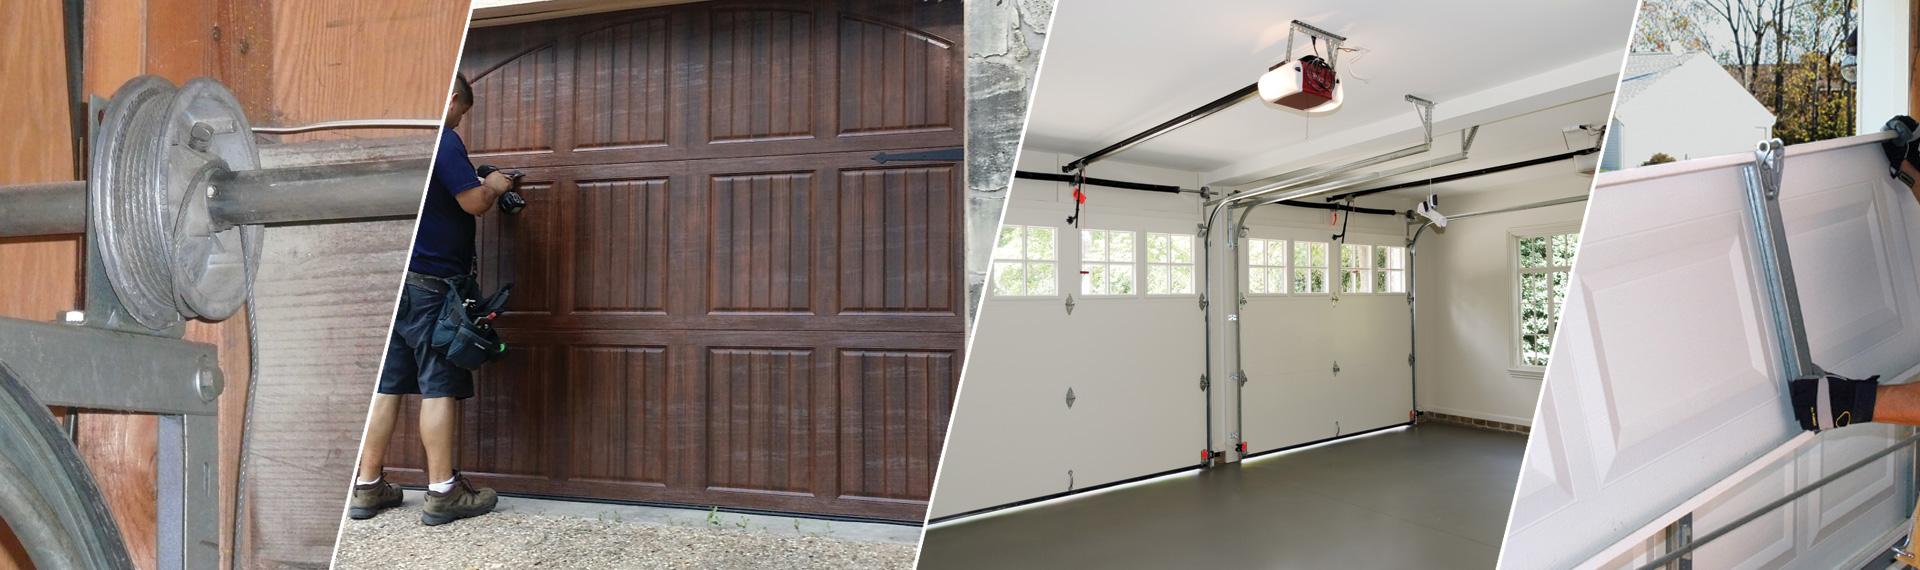 All Garage Door Services Pennsauken Township NJ